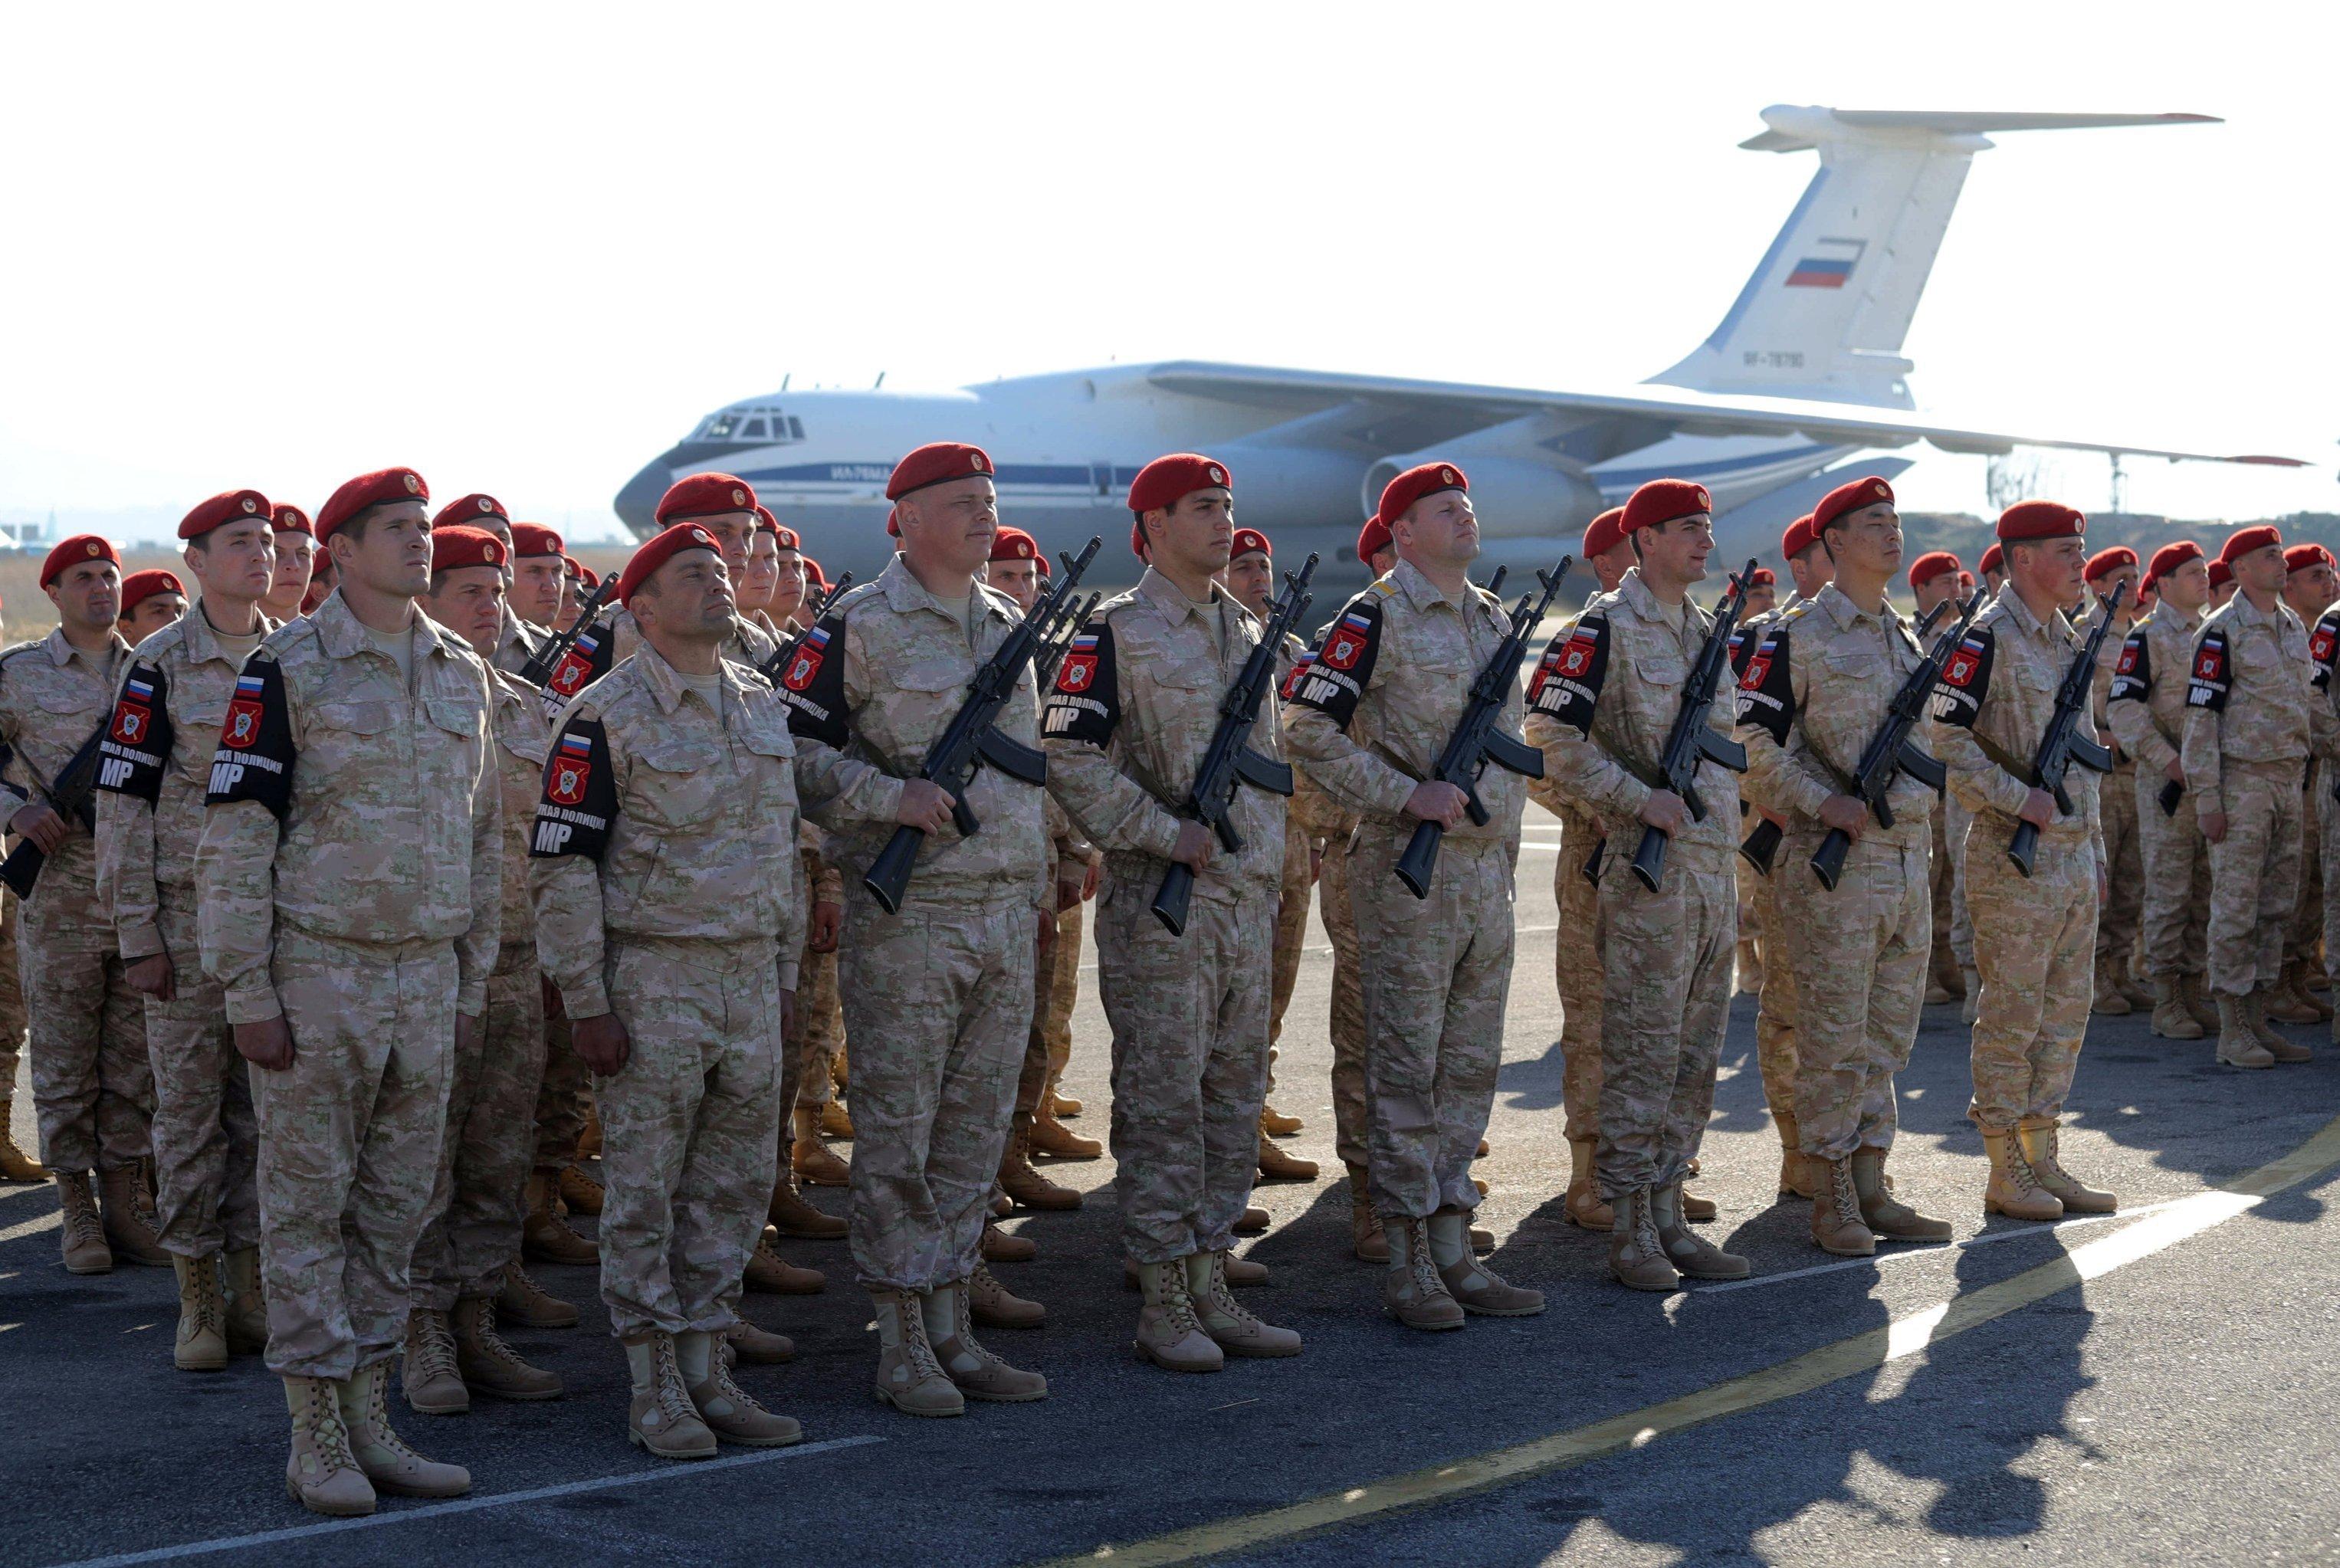 Russian army servicemen at the Khmeimim Air Base in Syria